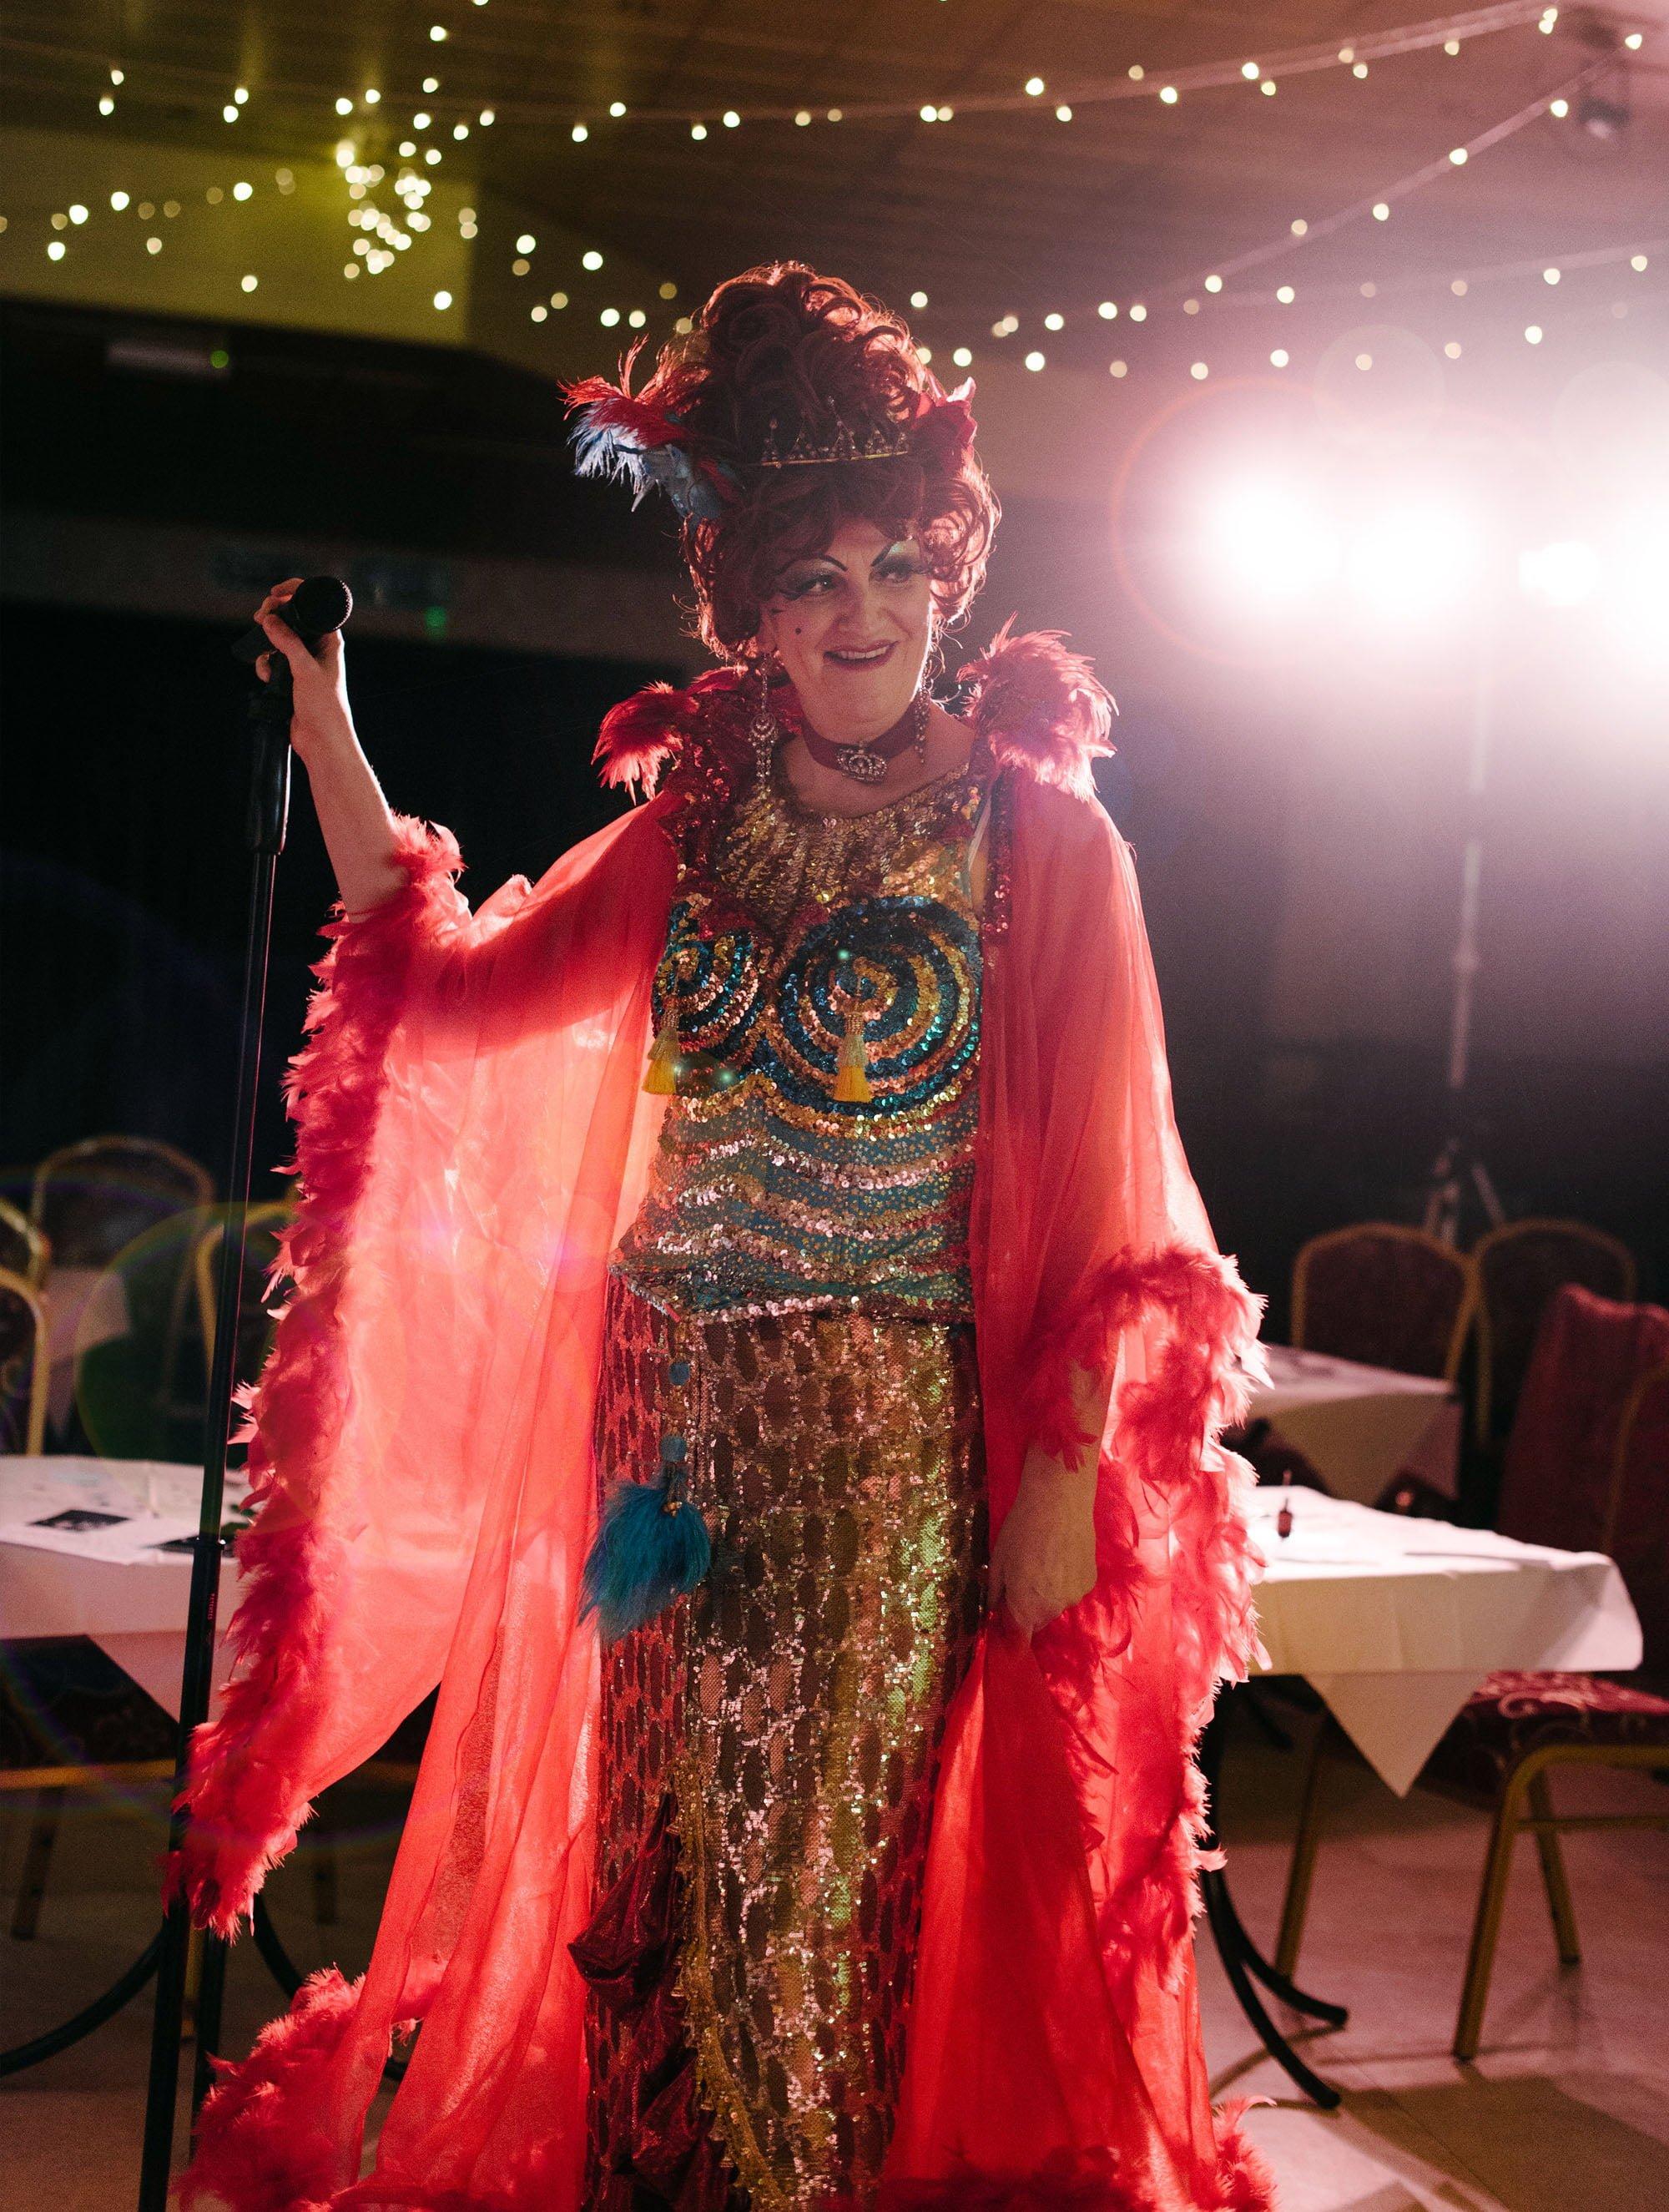 Mysi Valentine, from 'An Odd Occasion' cabaret show